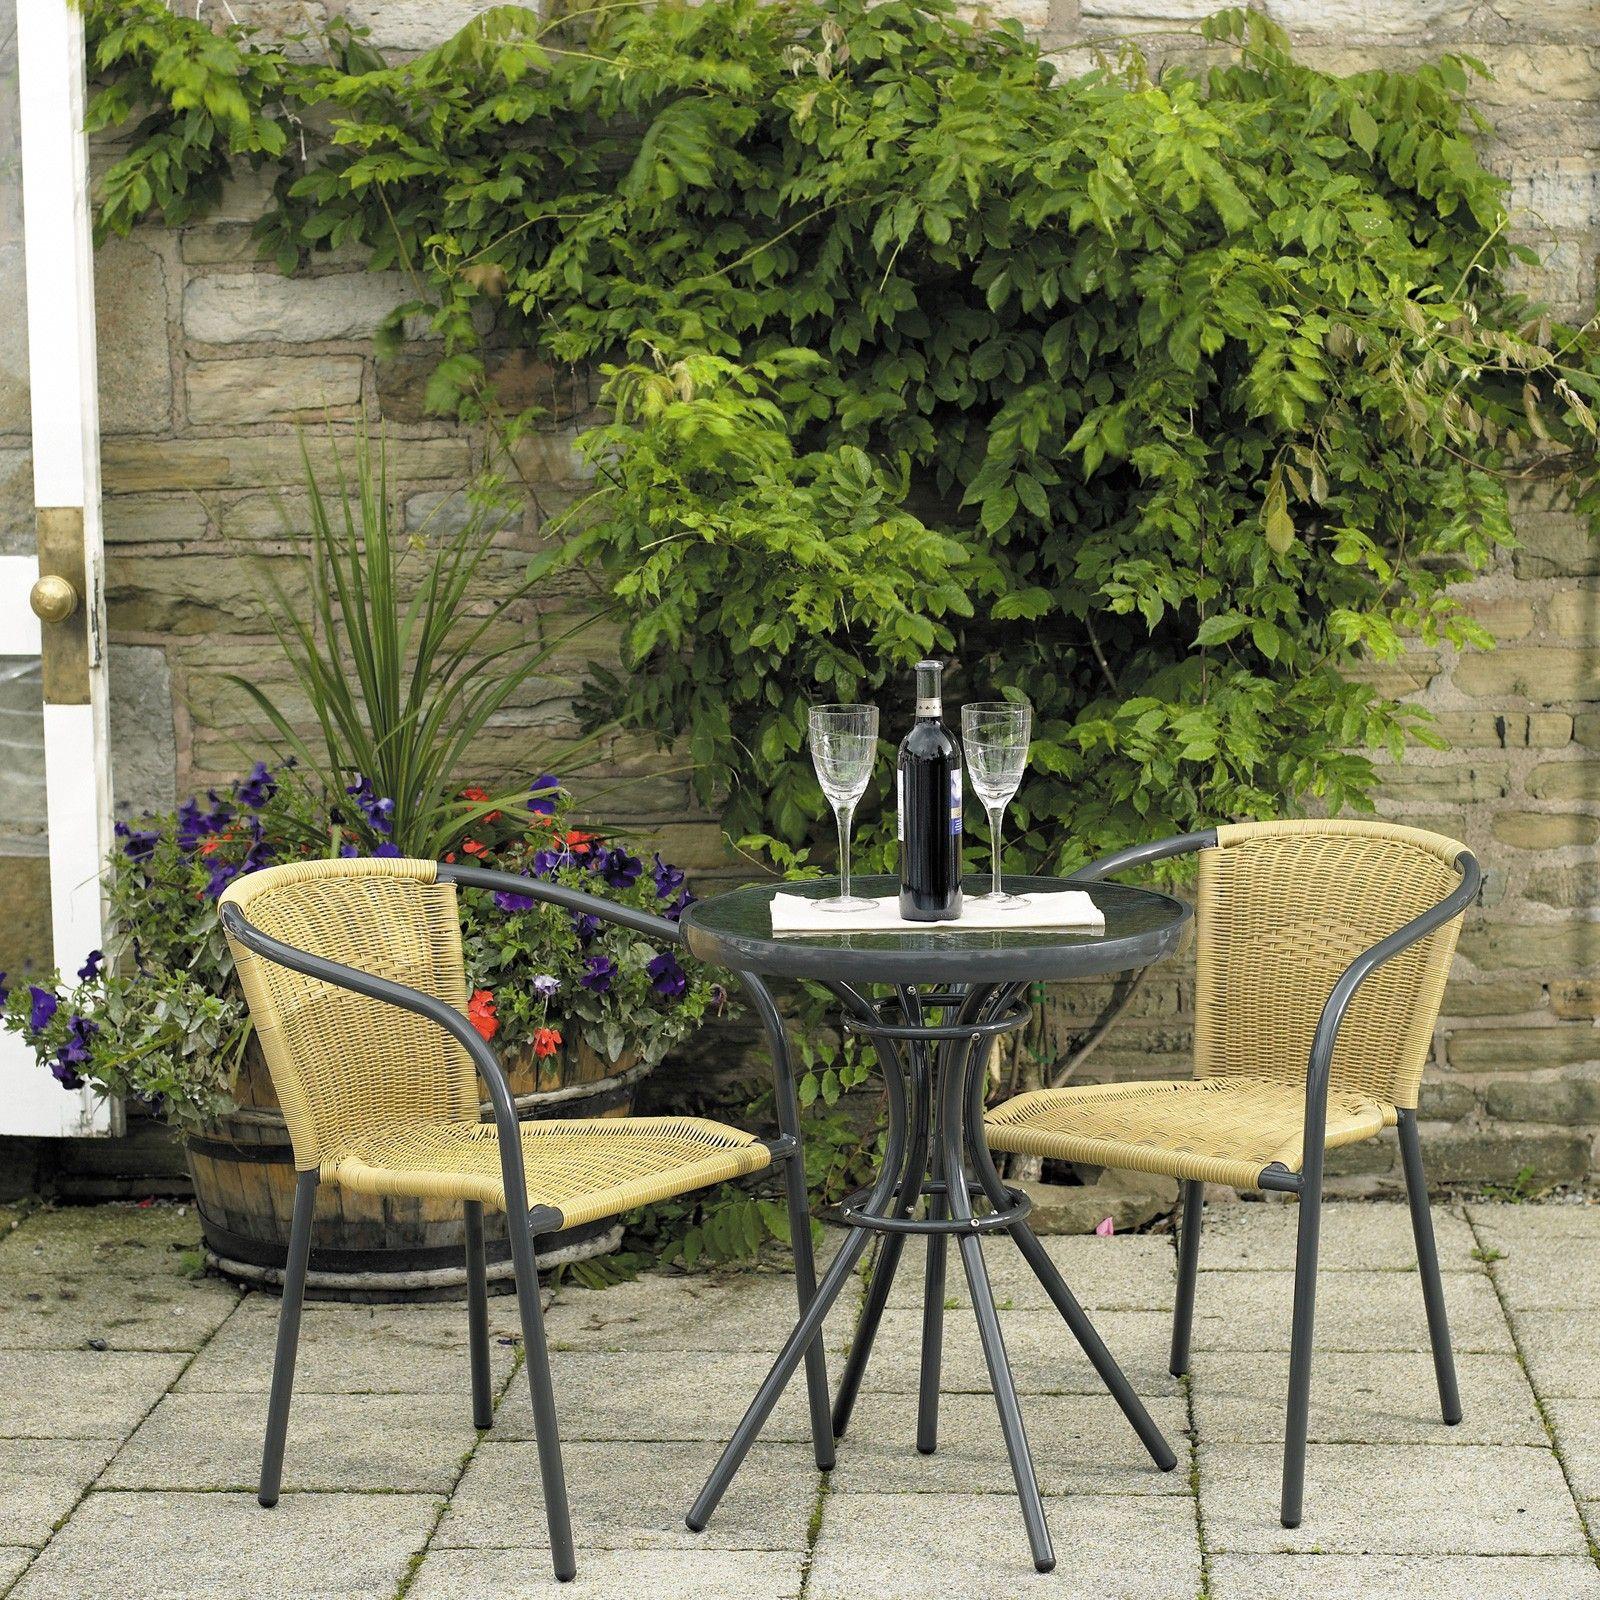 Small garden bistro table - Paris Bistro Set Patio Gardenssmall